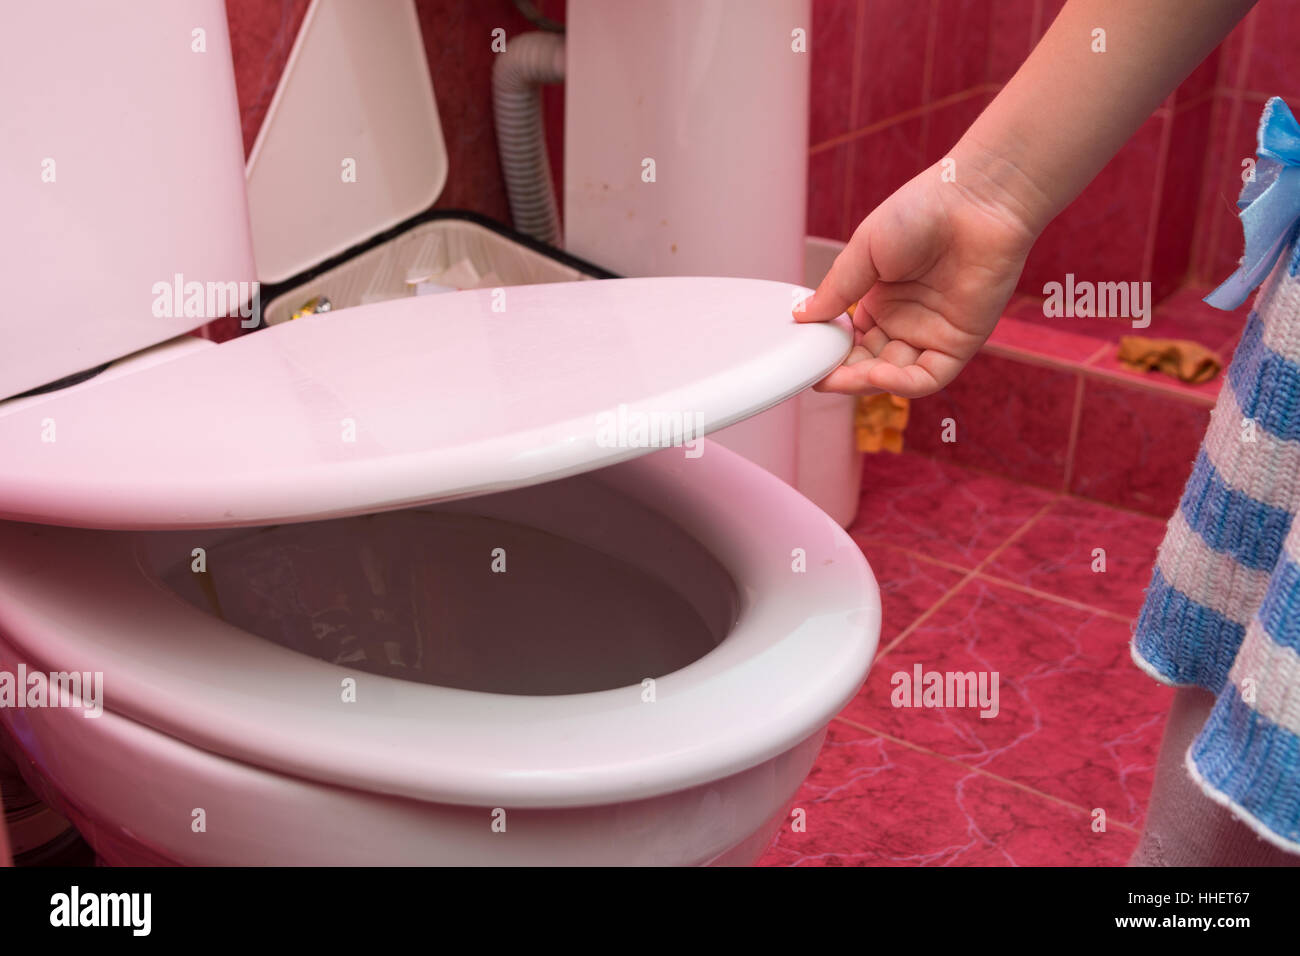 Amazing Aquatech Bath Lift Component - Luxurious Bathtub Ideas and ...